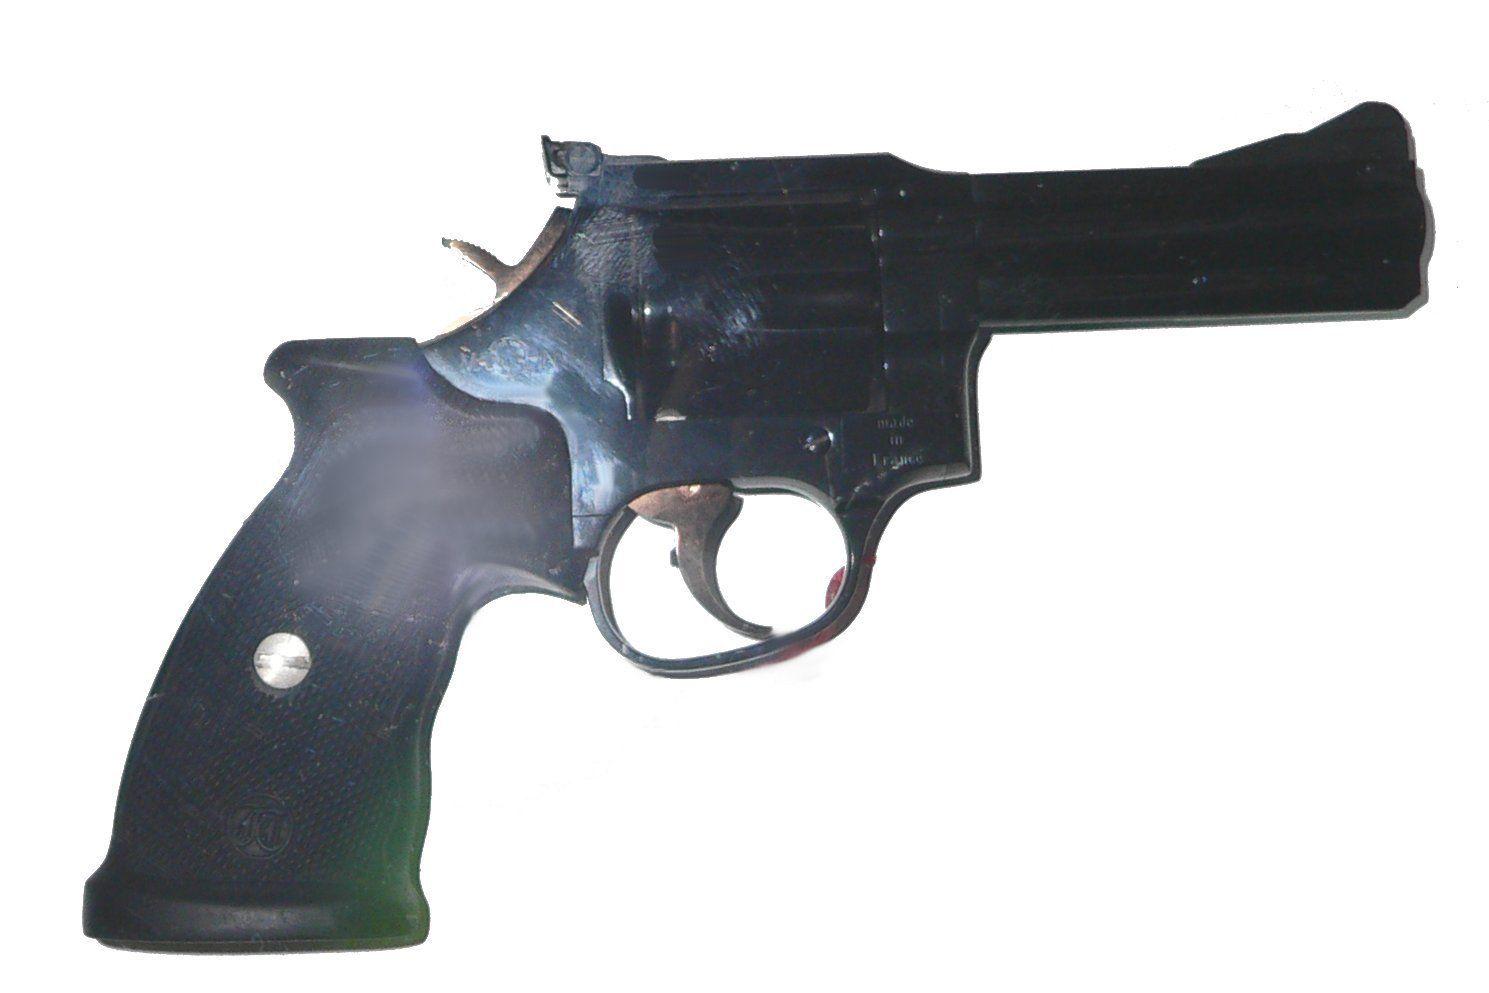 Policiers BallComment Vos Sont RevolverTaserFlash Armés c3q5ARL4jS